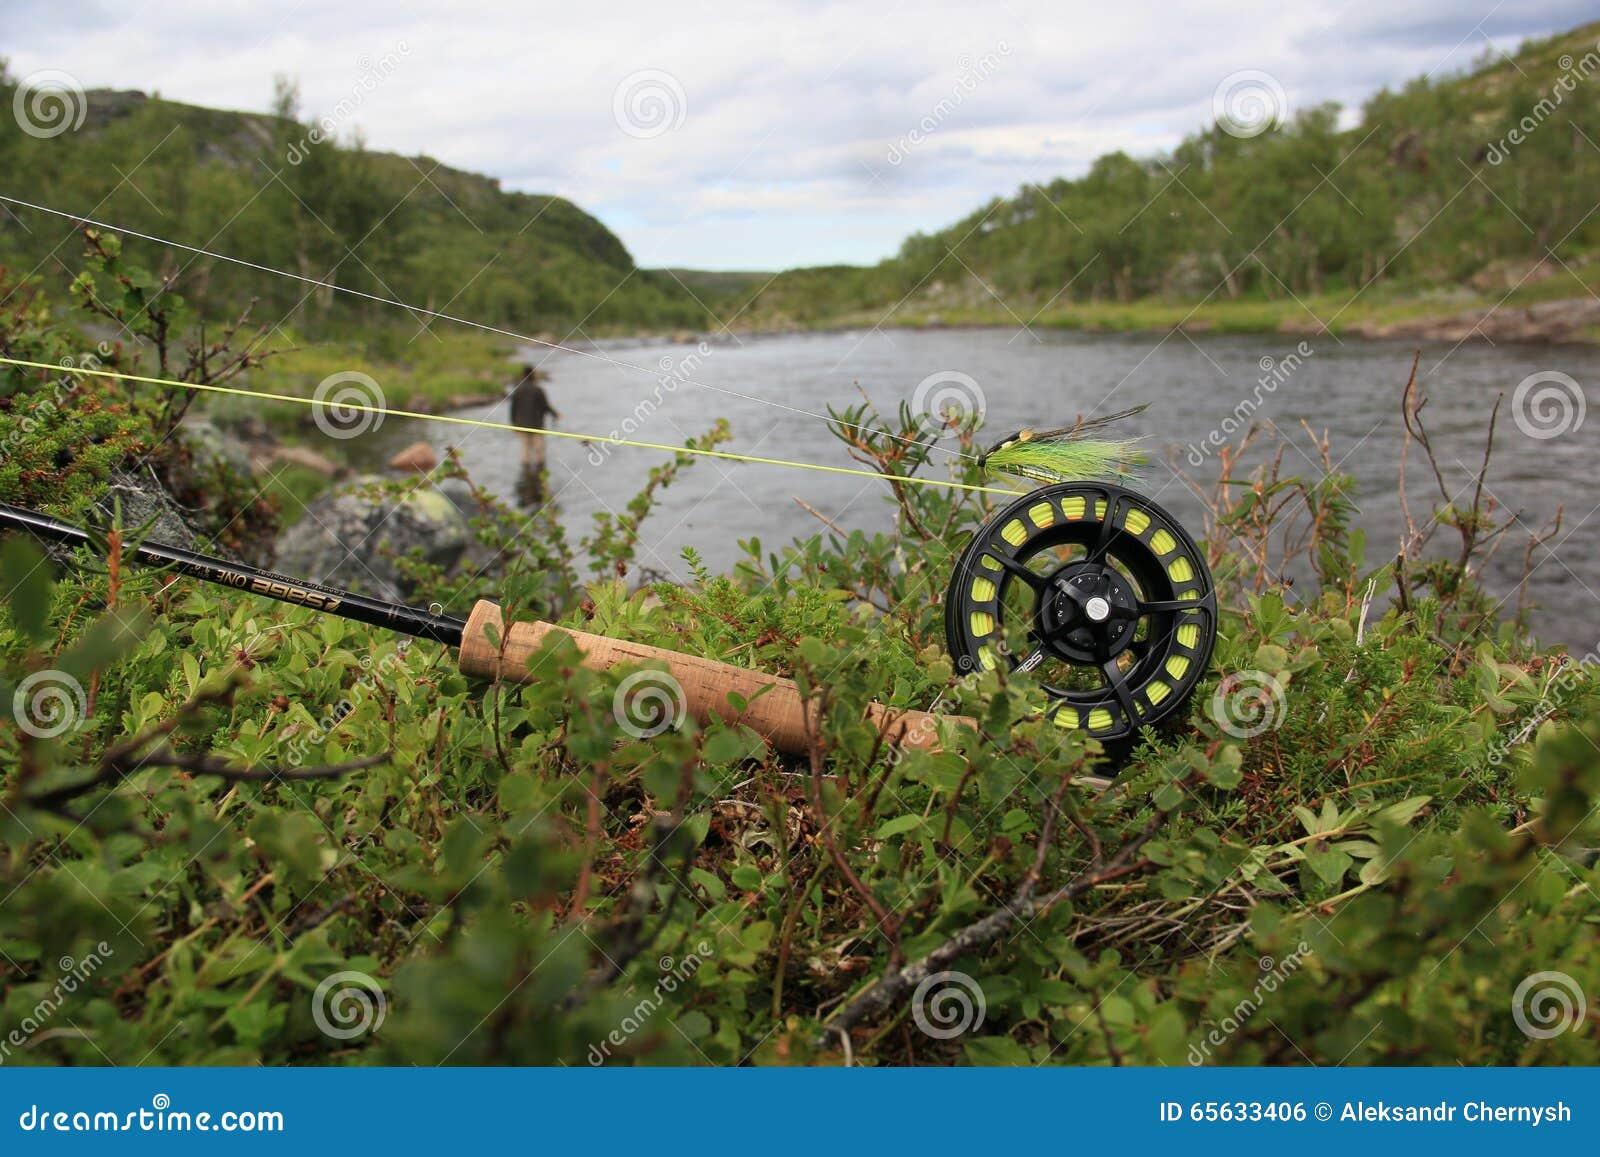 Pêche de mouche, tige, bobine, la rivière Salmon, pêcheur